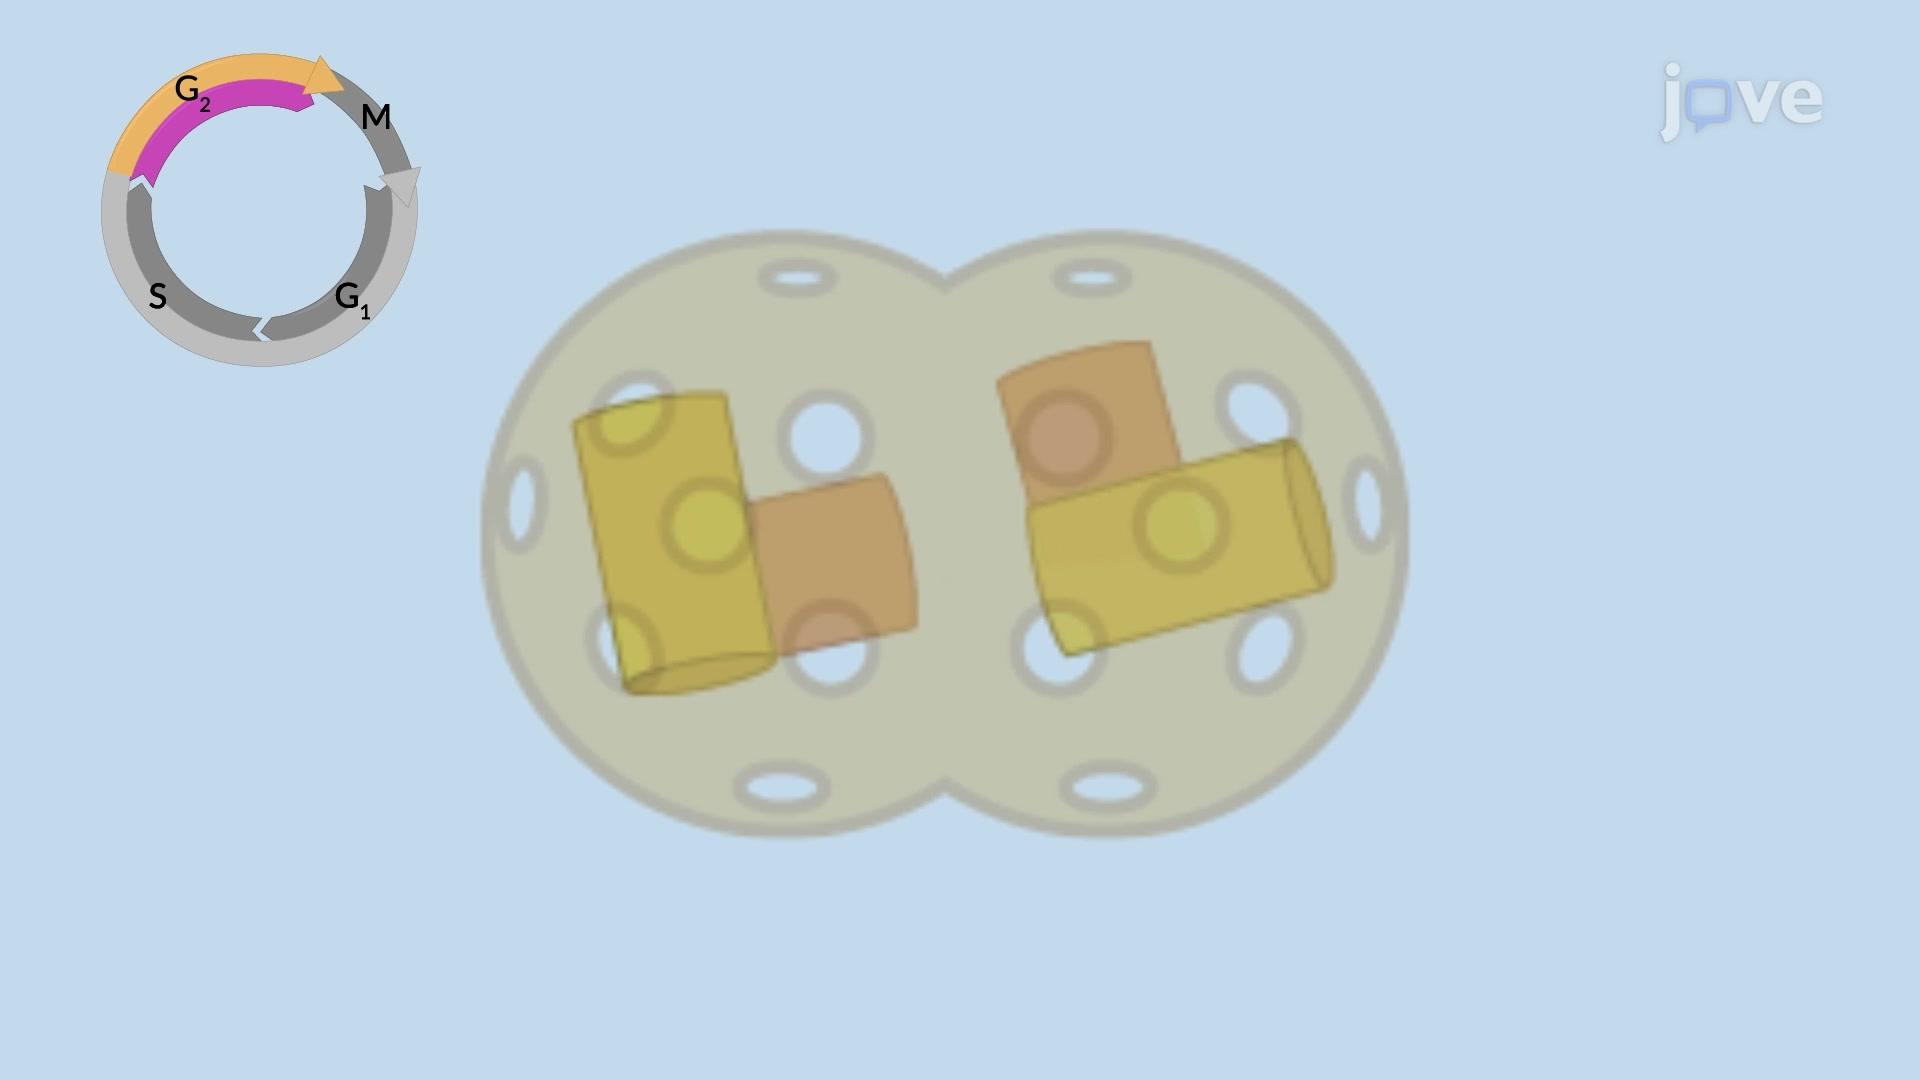 Centrosome Duplication